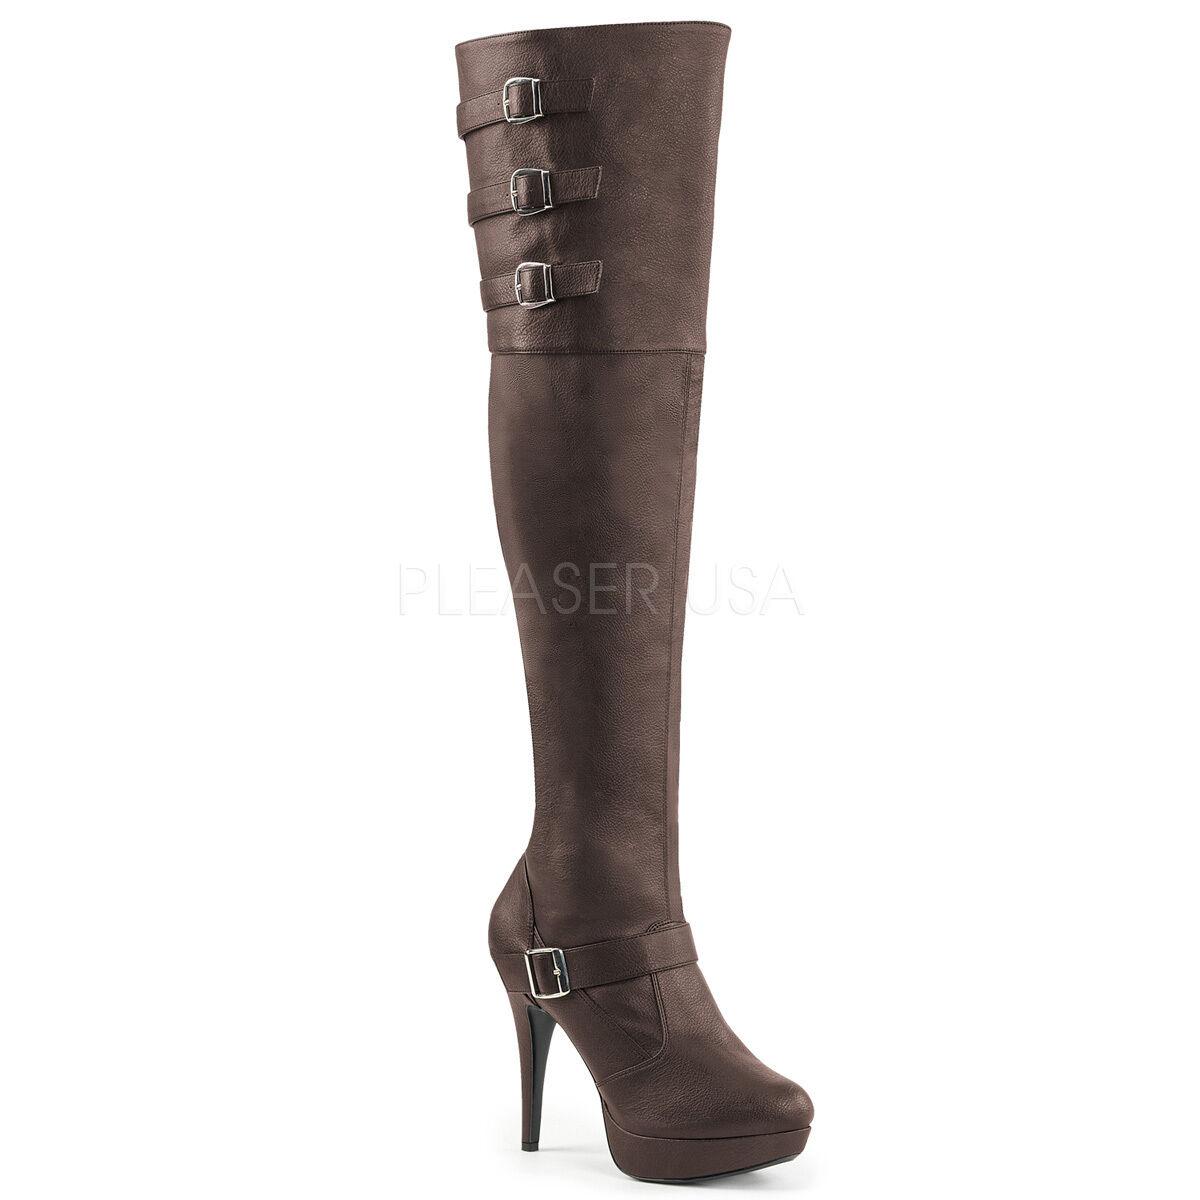 Chloe Chloe Chloe Thigh High Plus Size Wide Width Shaft Boots Brown Leatherette 9-16 3a7ffb